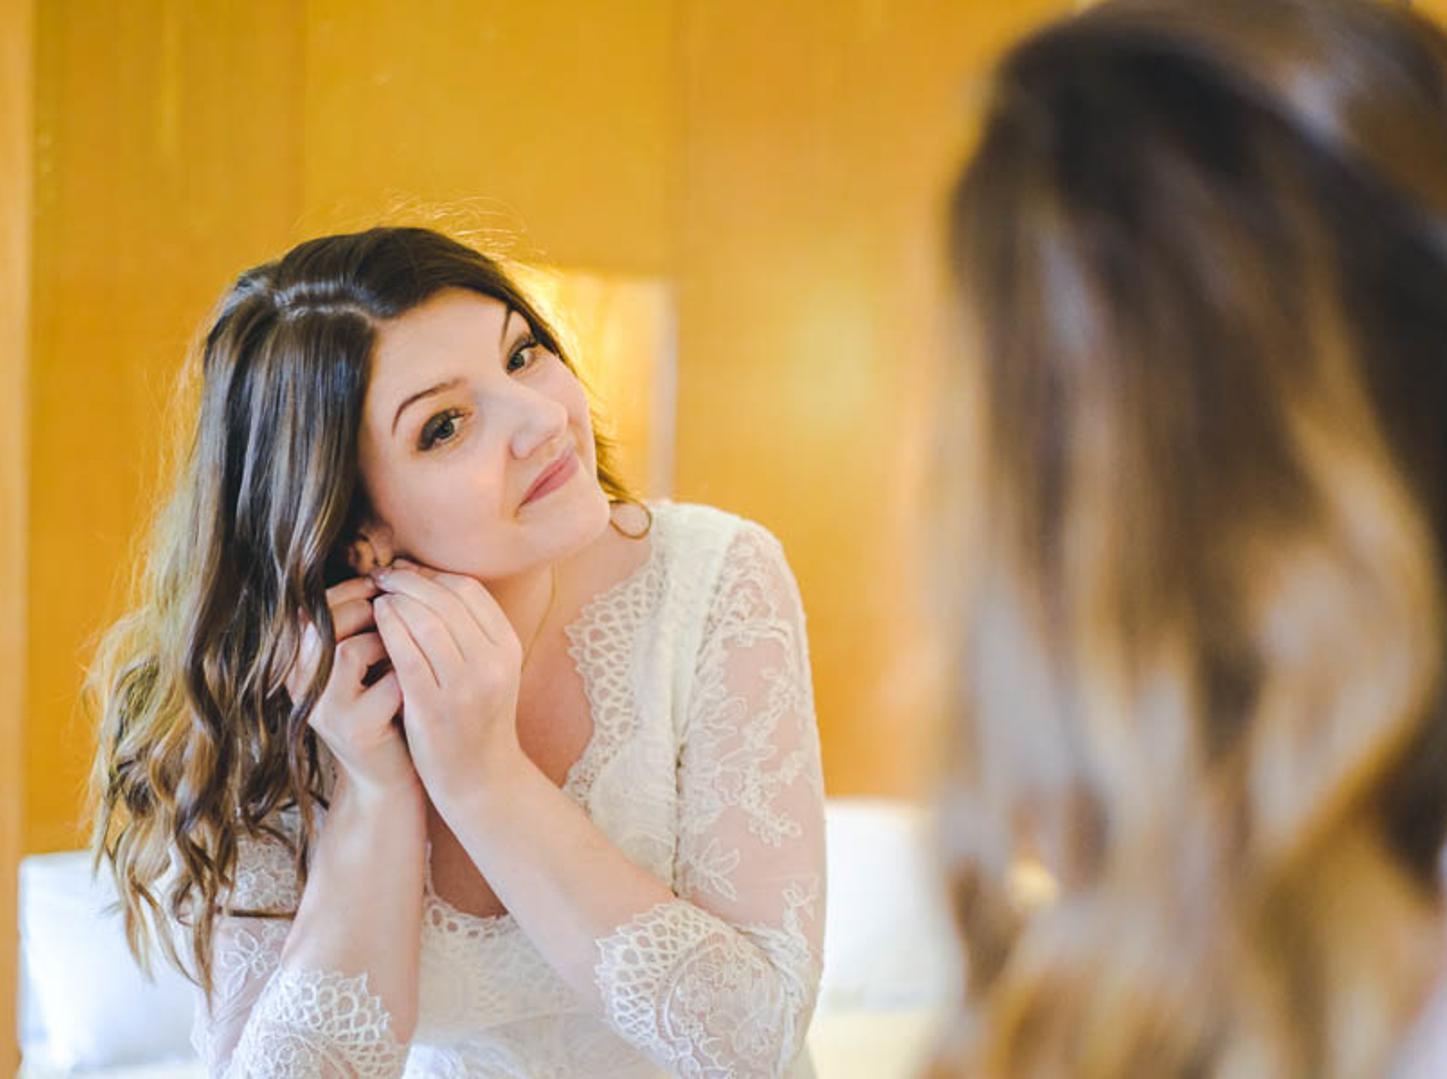 bodas-sin-clasificar-sin-tema-cuba-42232.jpg